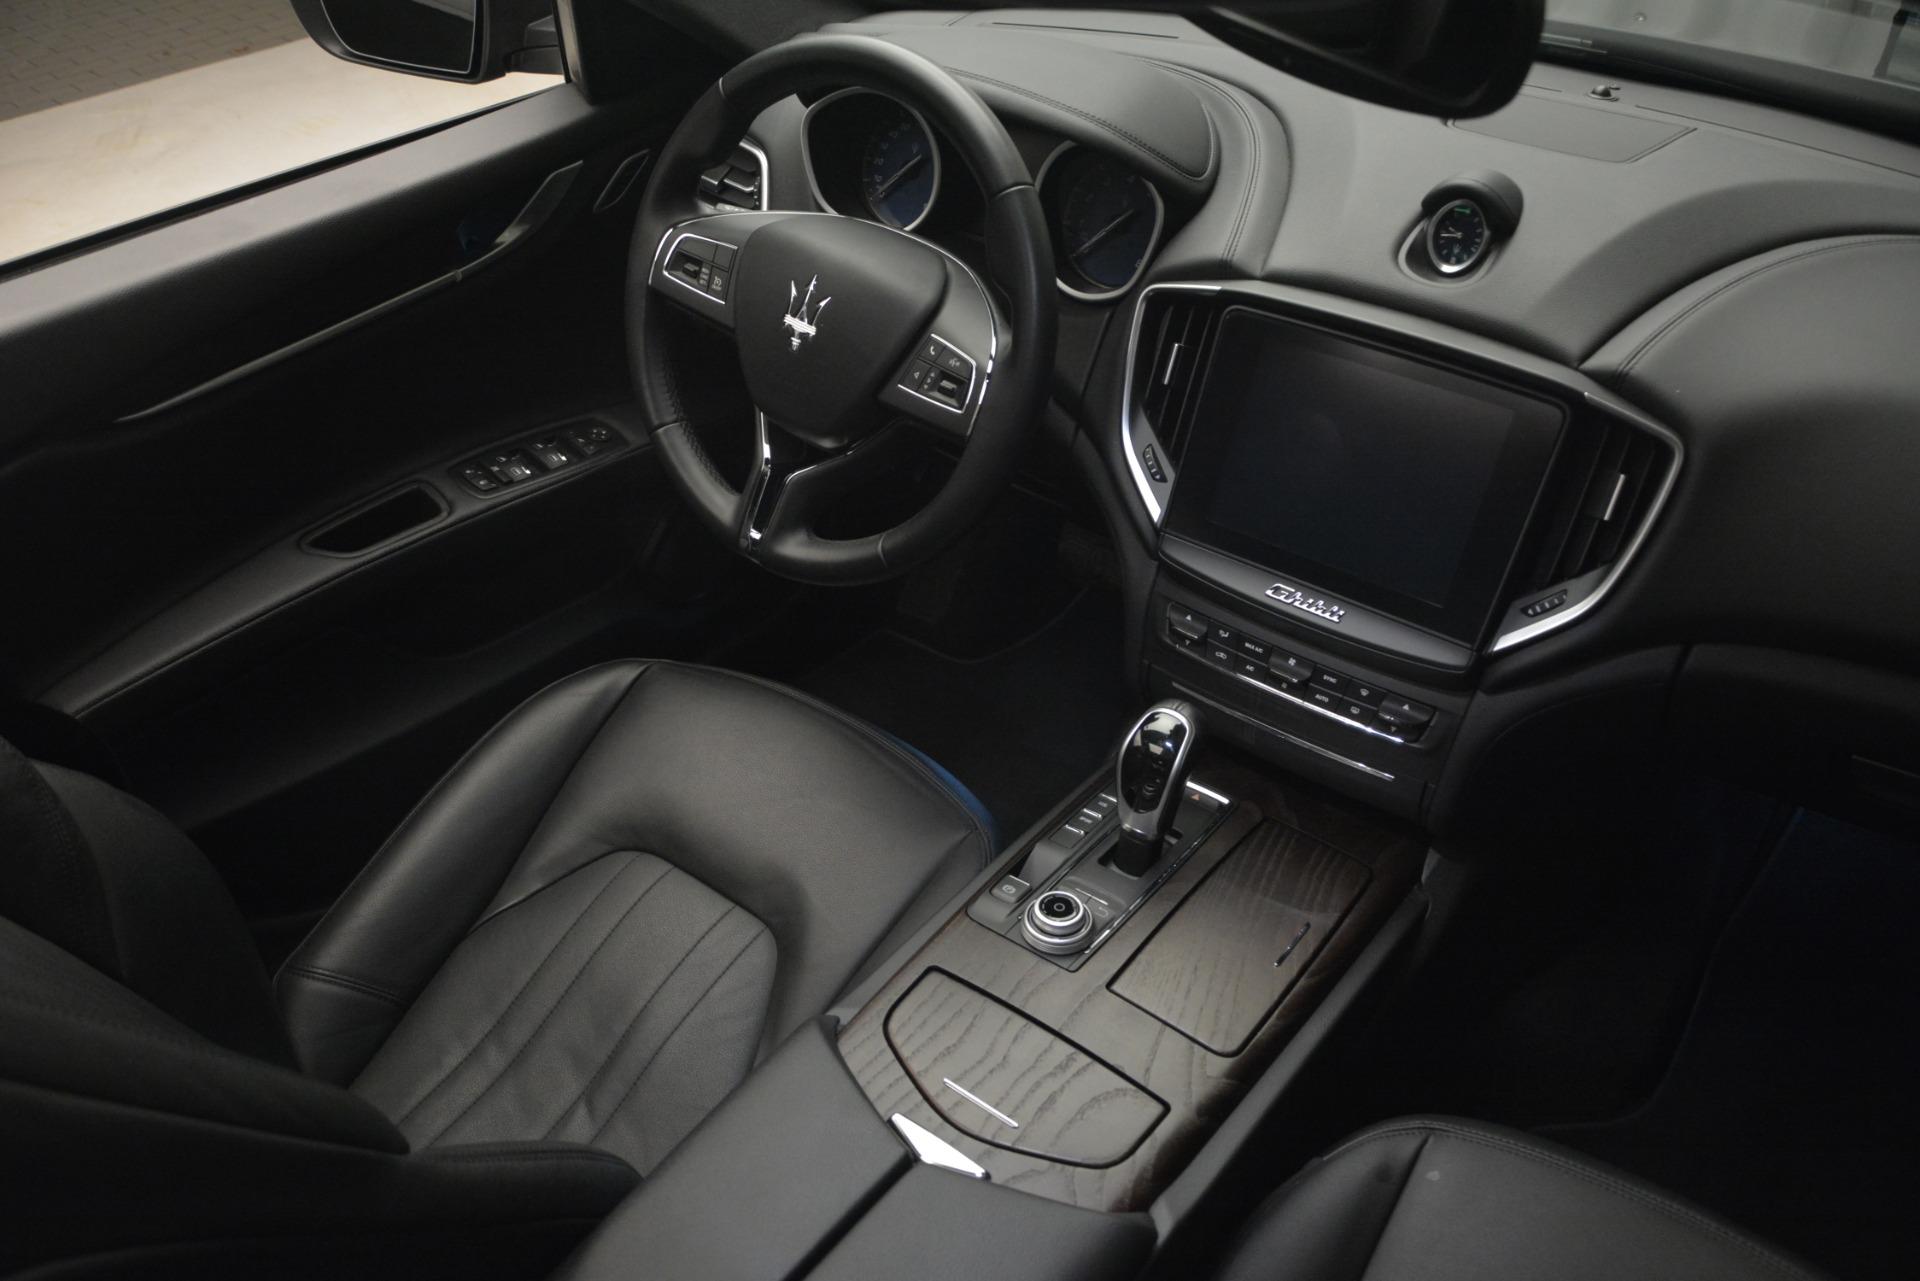 Used 2018 Maserati Ghibli S Q4 For Sale In Greenwich, CT. Alfa Romeo of Greenwich, 7481 2944_p19